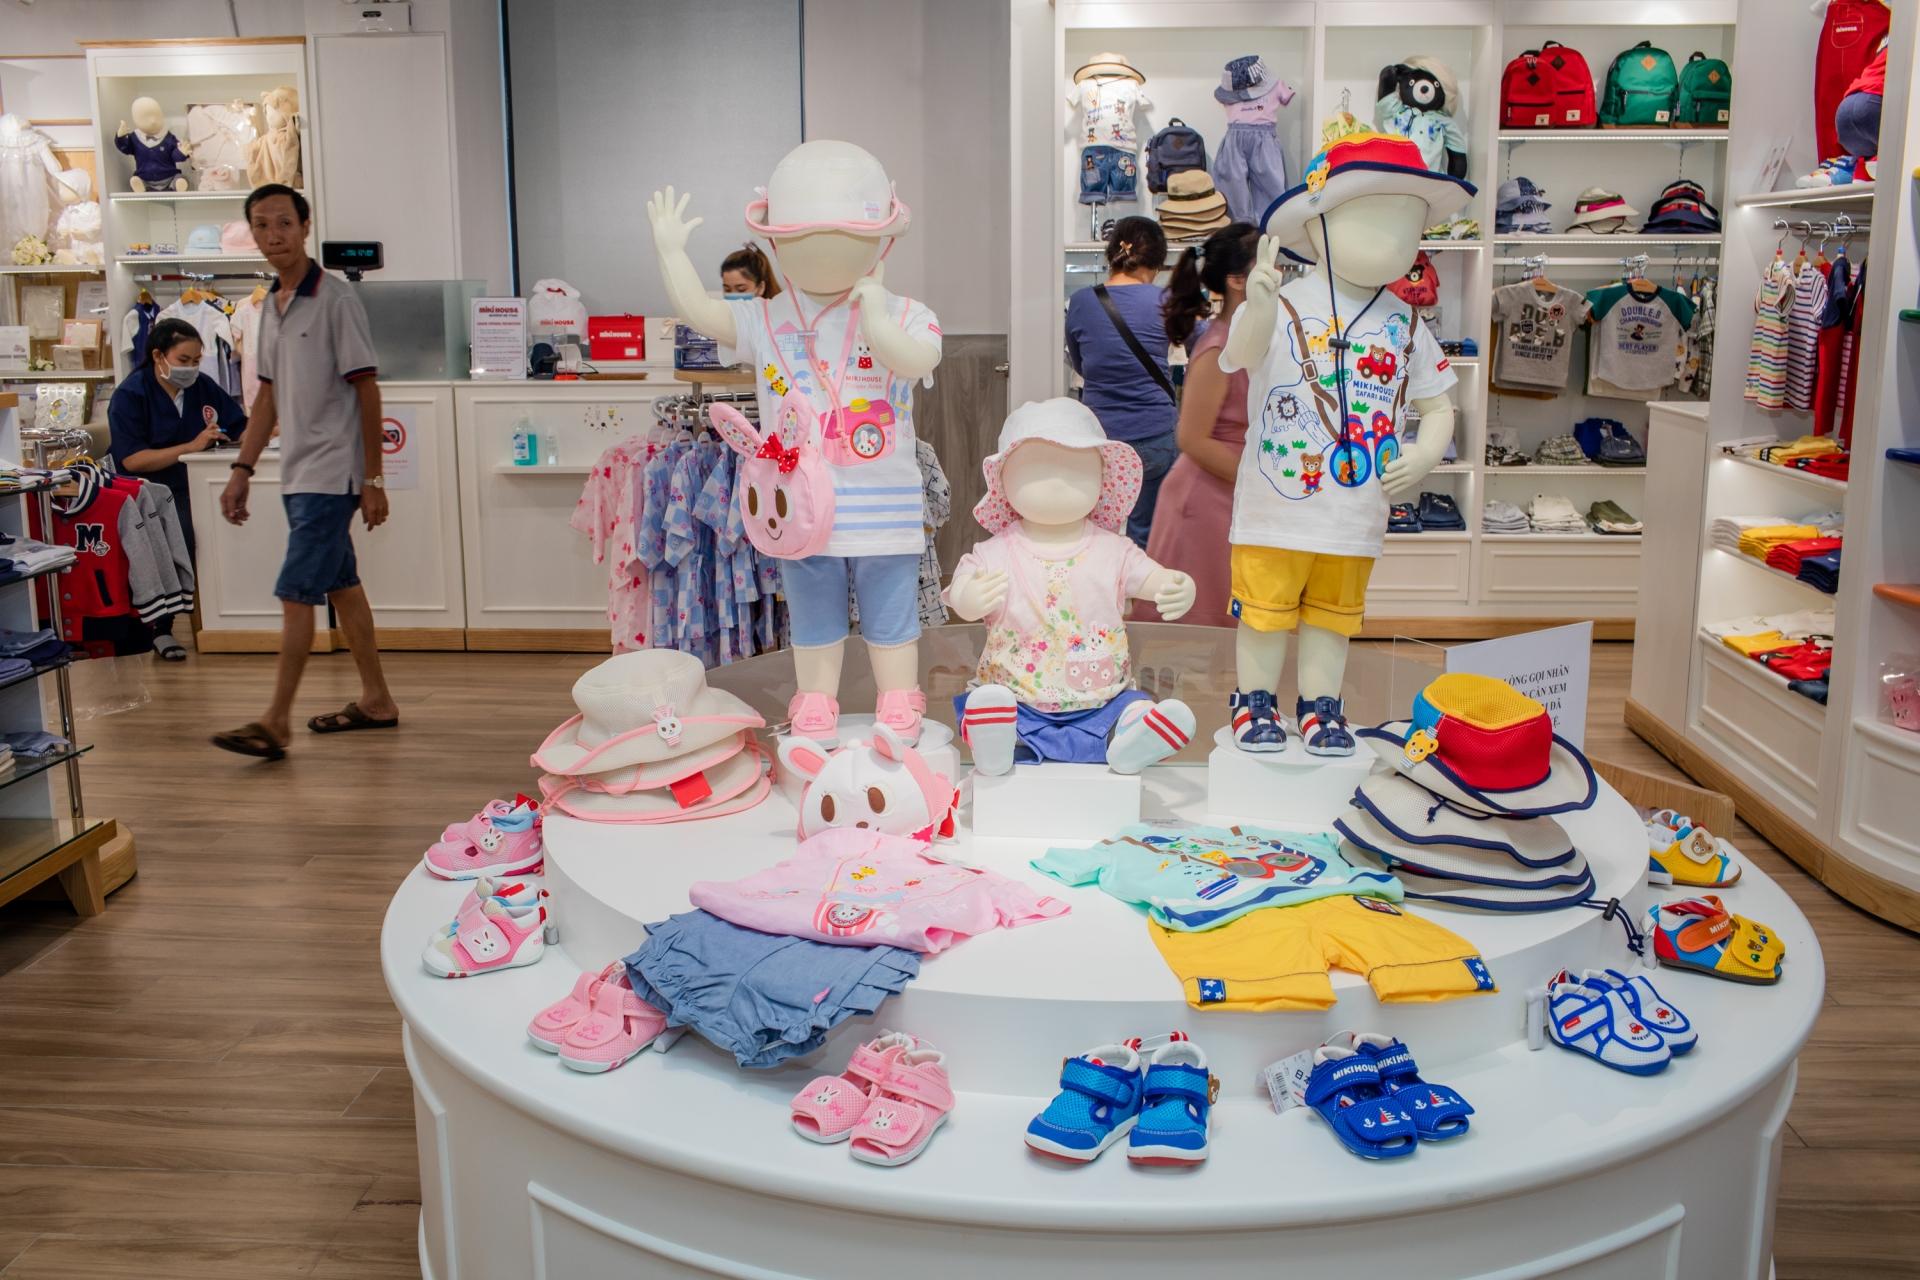 japanese kidswear brand opens first store in vietnam